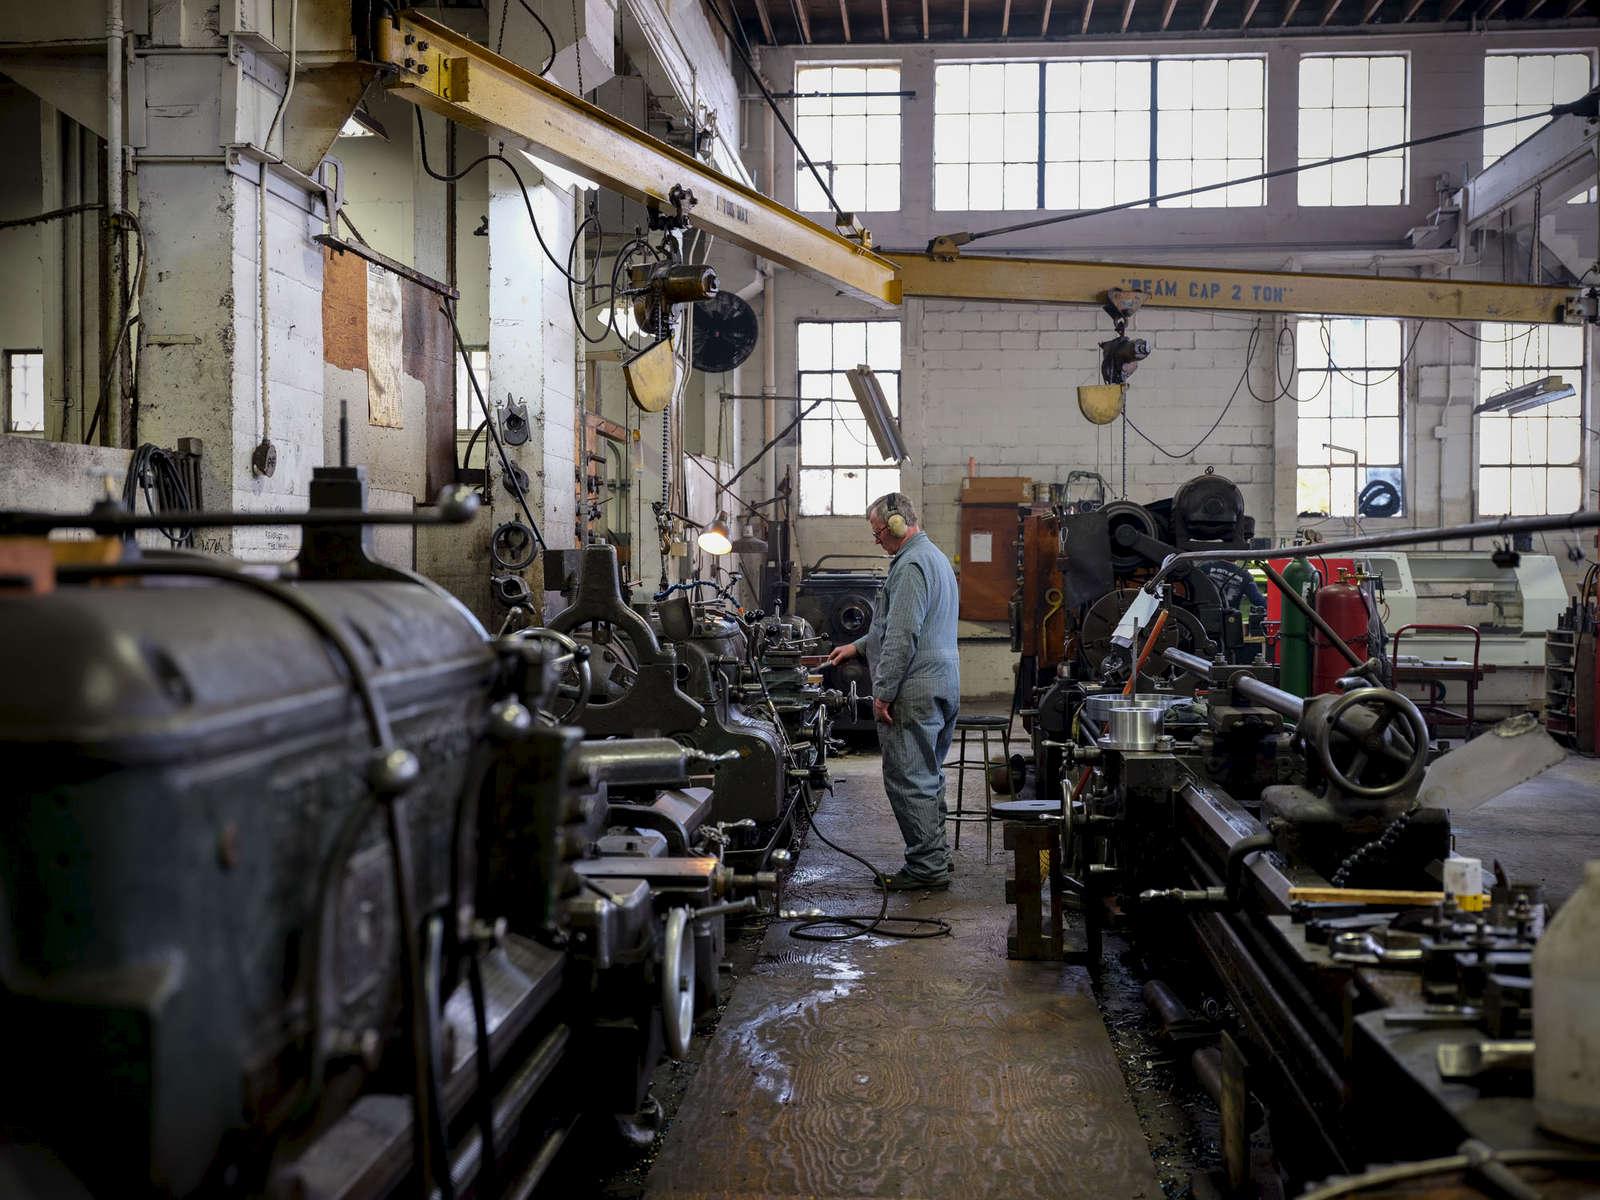 Premier Gear and Machine Works